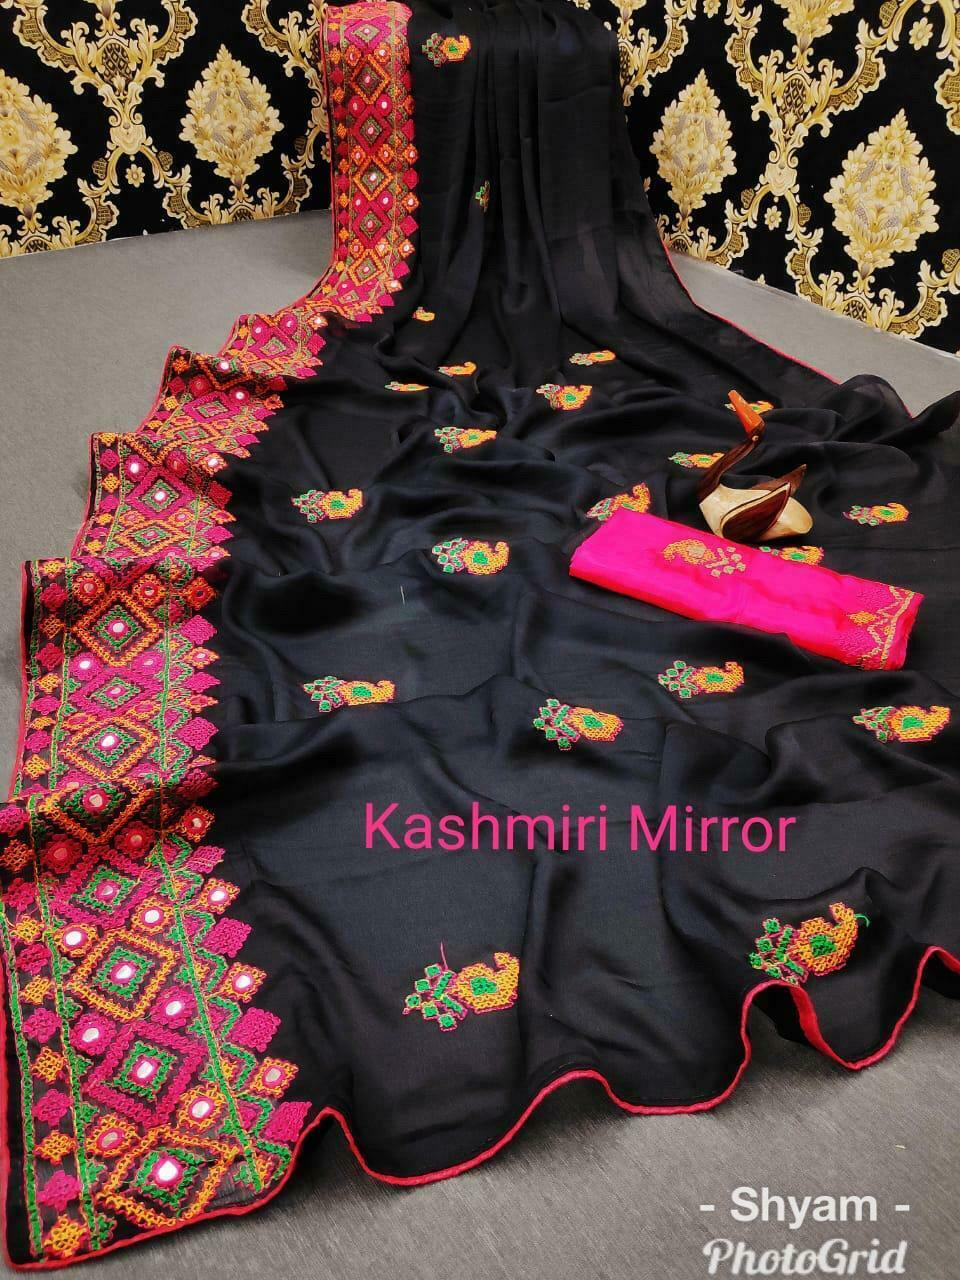 National Dress Day Indian Embroidered Thread Work & mirror work Saree SE19-3